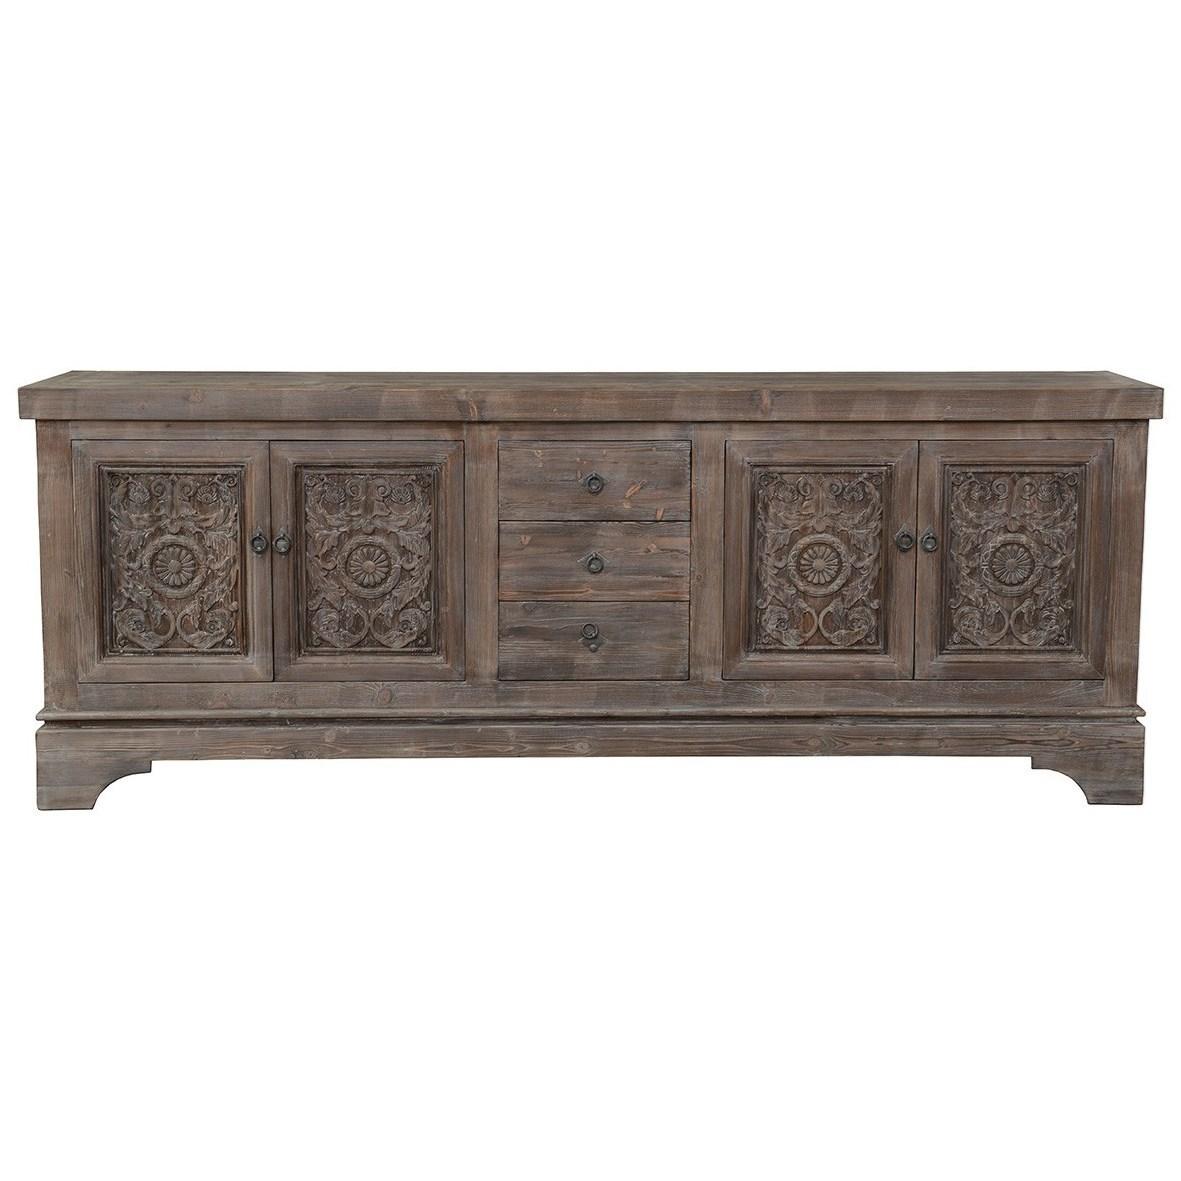 Amita Mocha Sideboard by Classic Home at Baer's Furniture